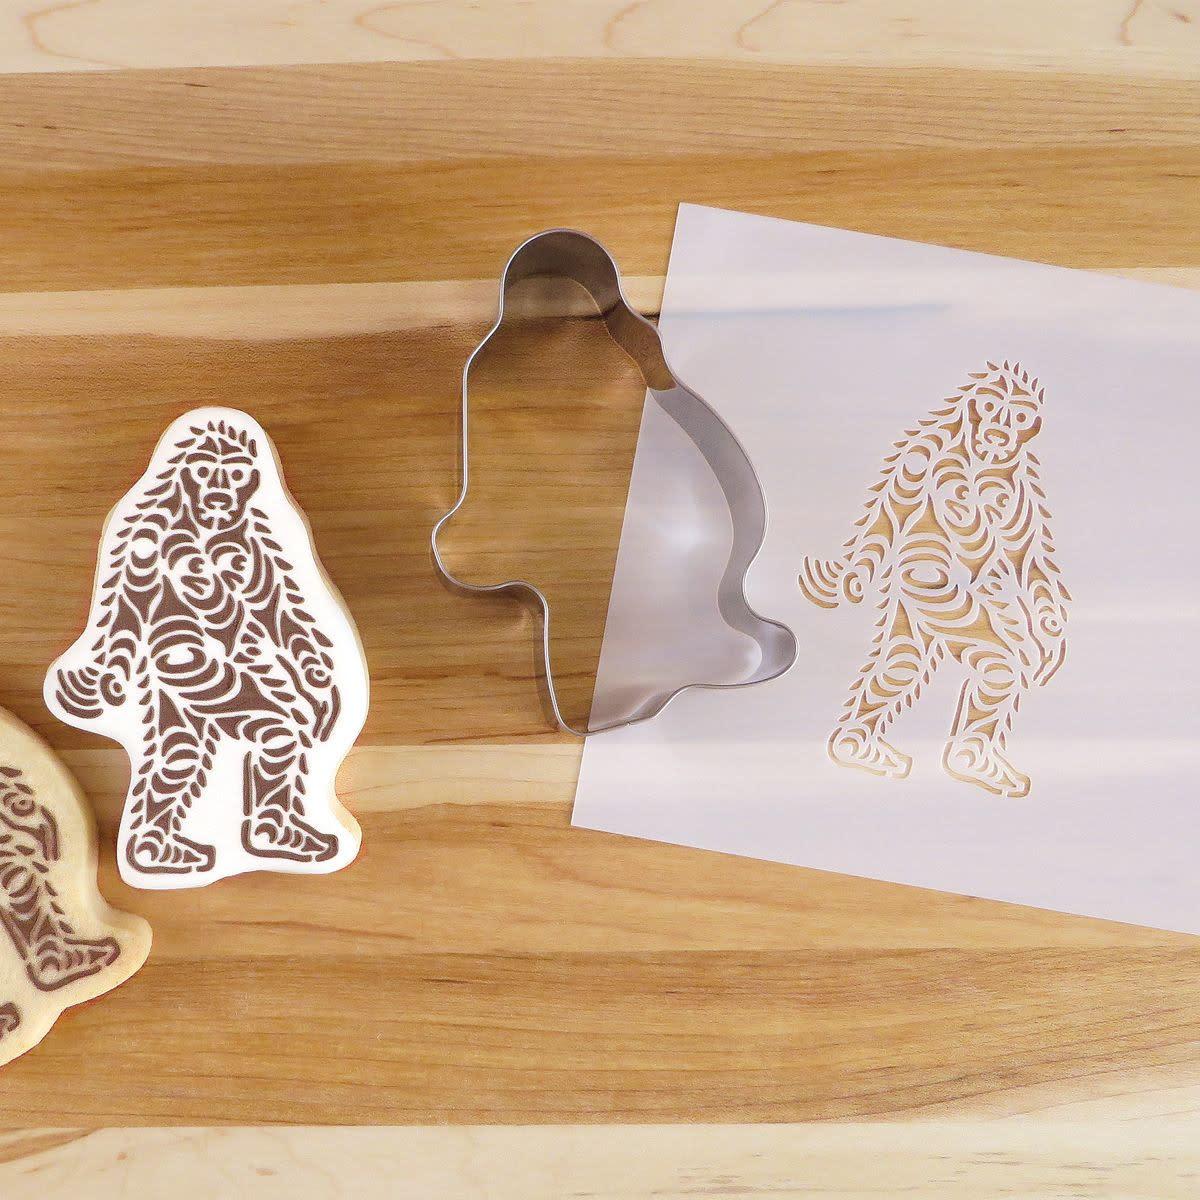 Cookie Cutter & Stencil Set-Sasquatch by Francis Horne Sr.-1